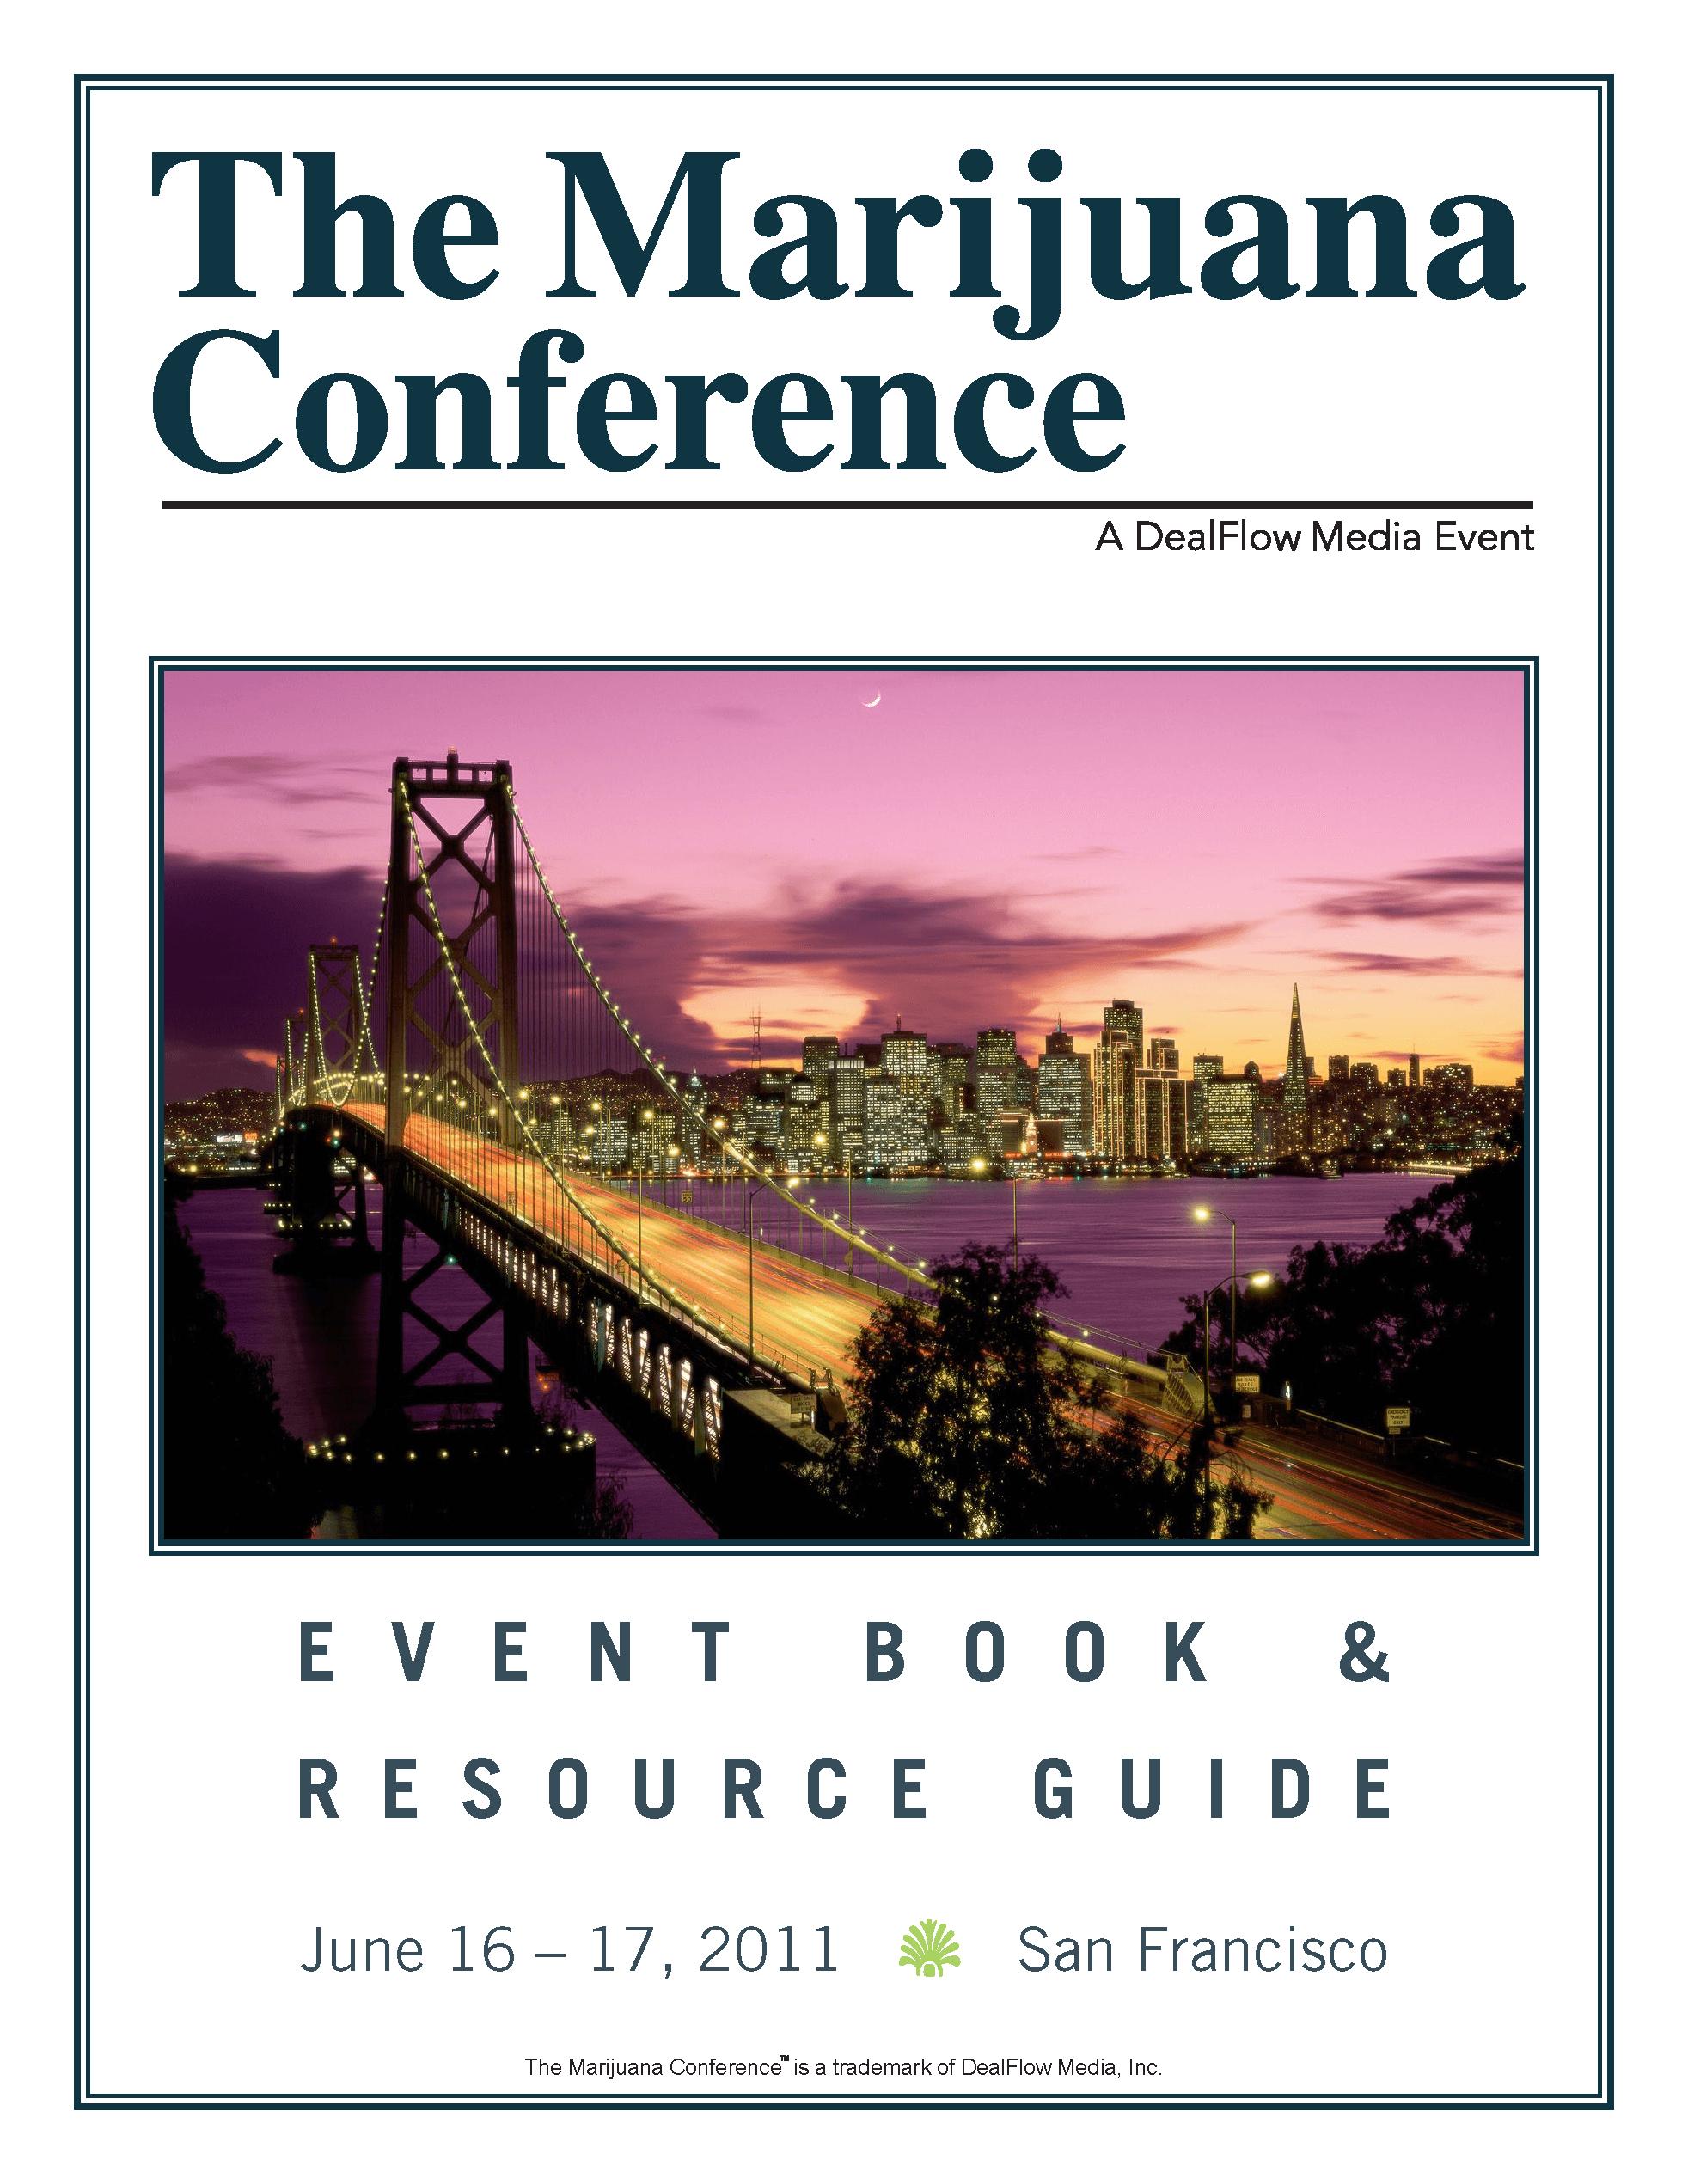 The Marijuana Conference